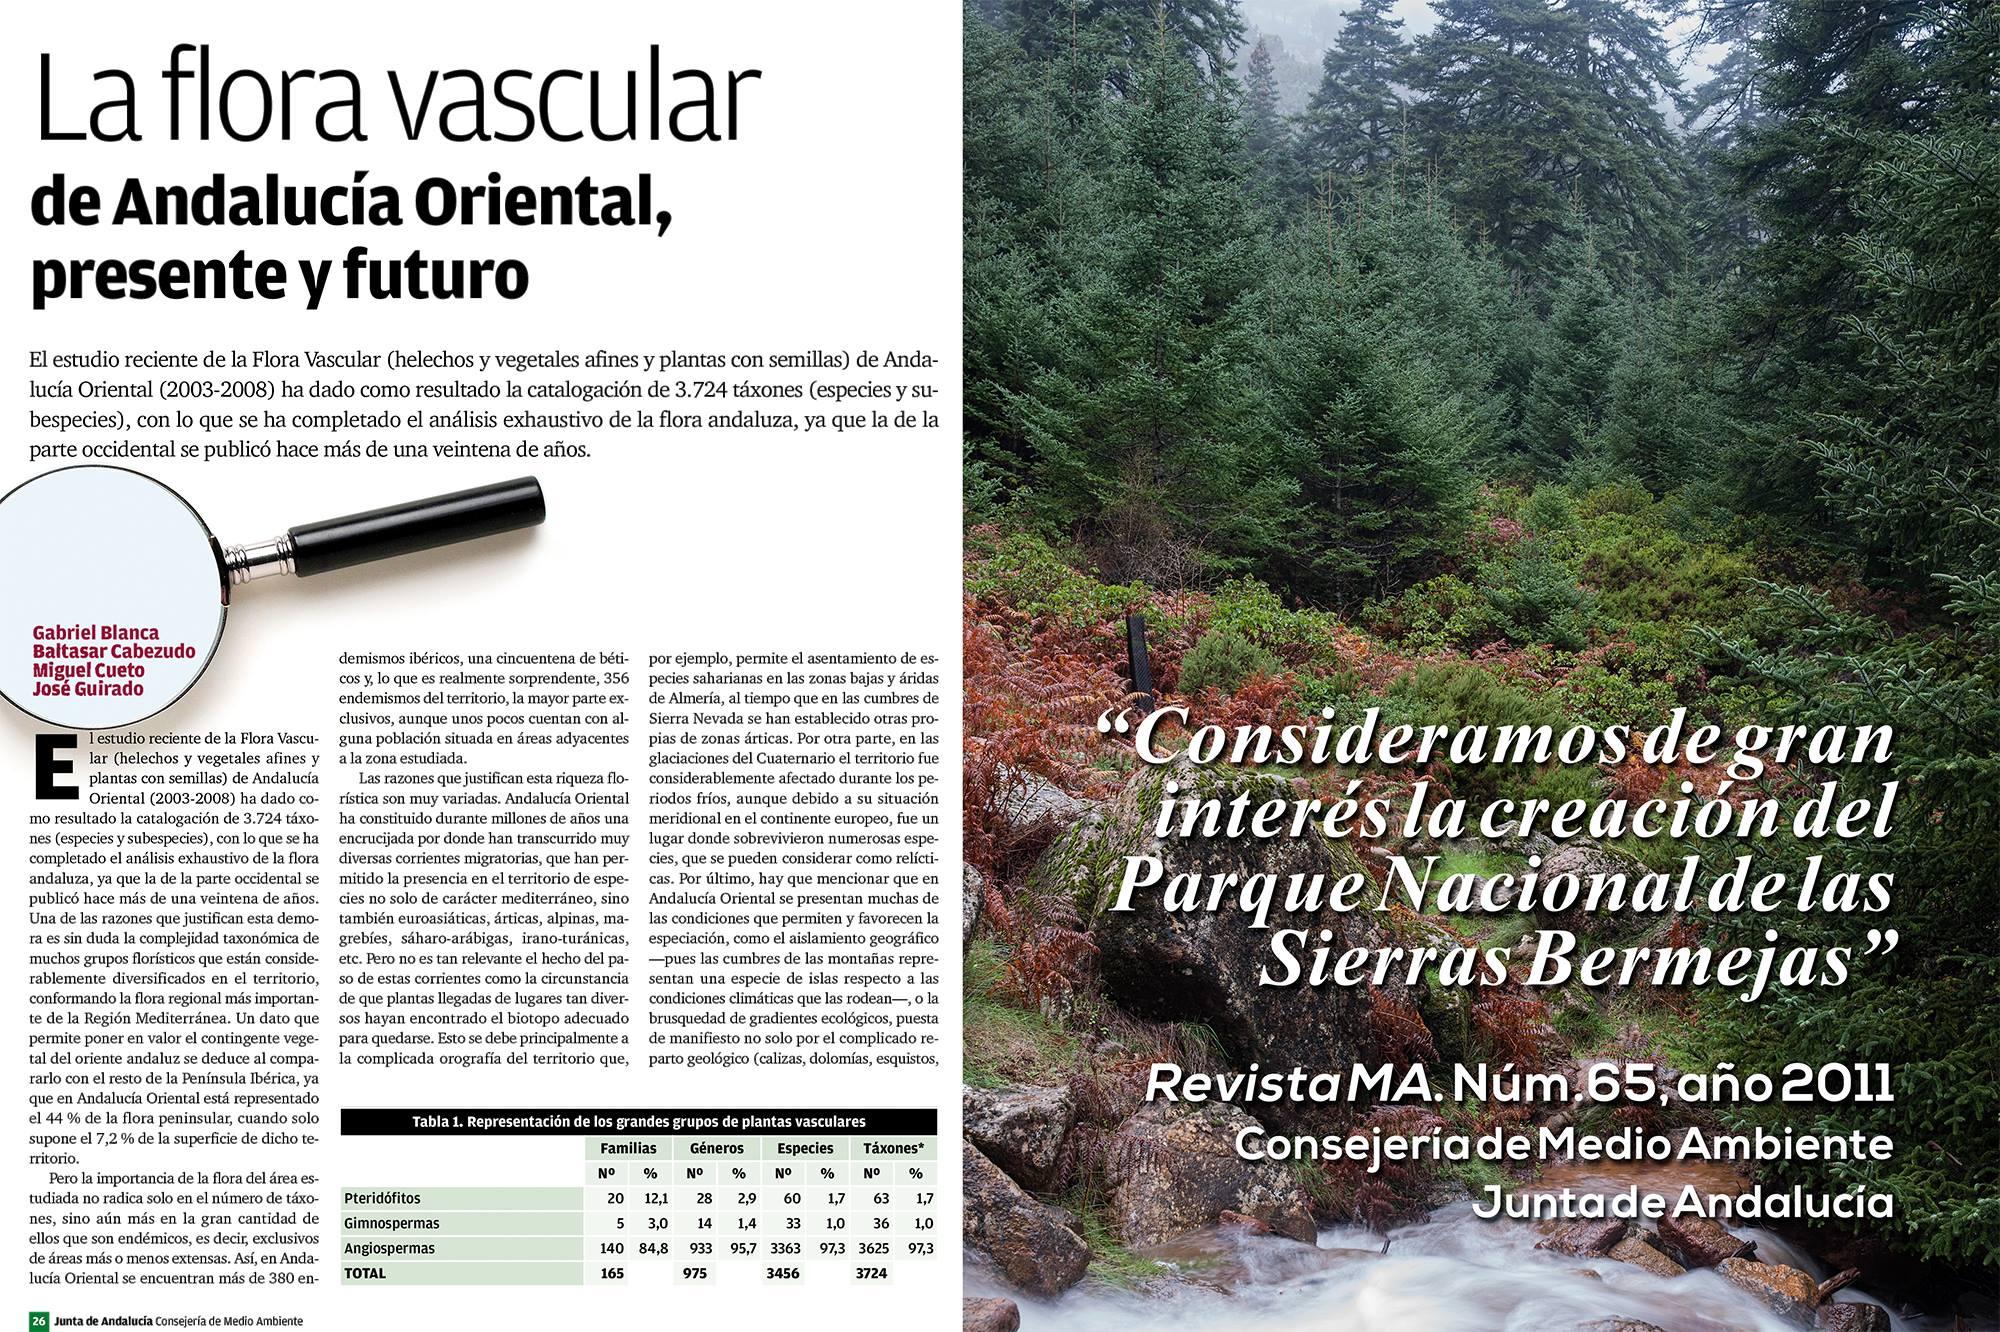 Revista MA núm.65 -2011